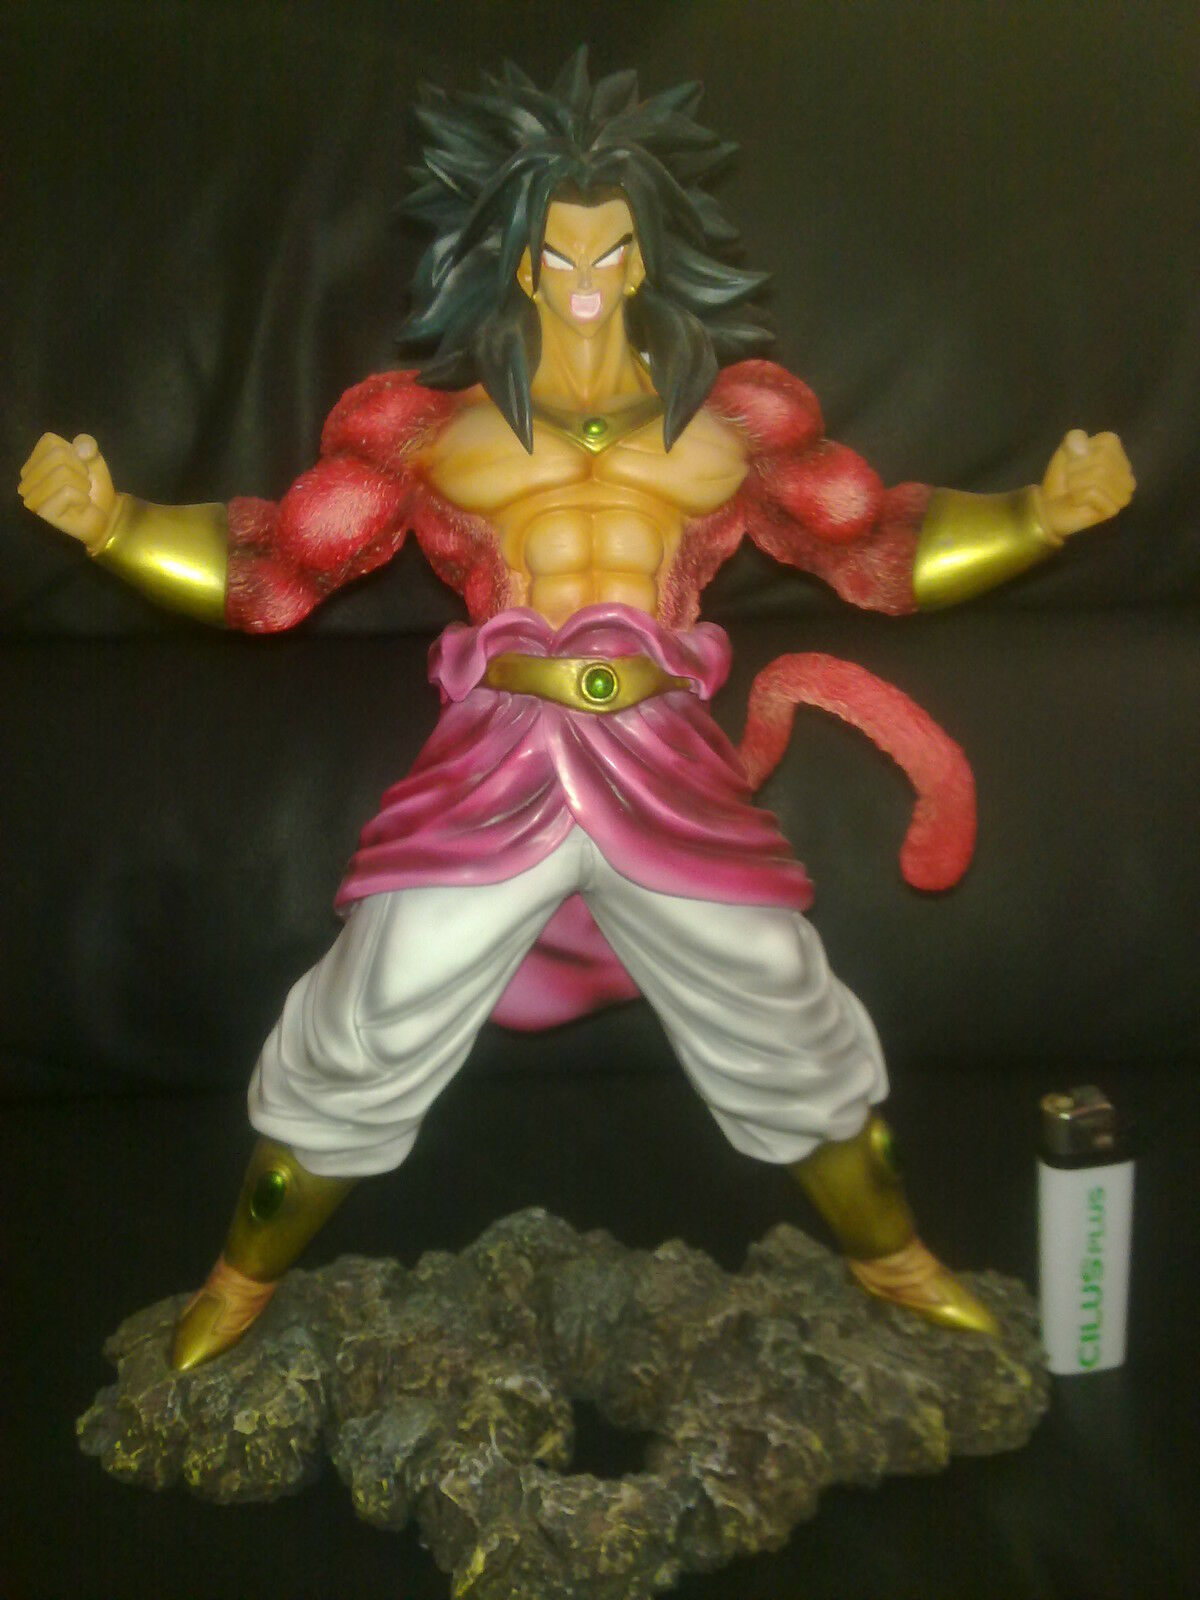 Dragon ball Resin figure broly ss4 ss4 ss4 super saiyan dragonball figura resina statue bb067f